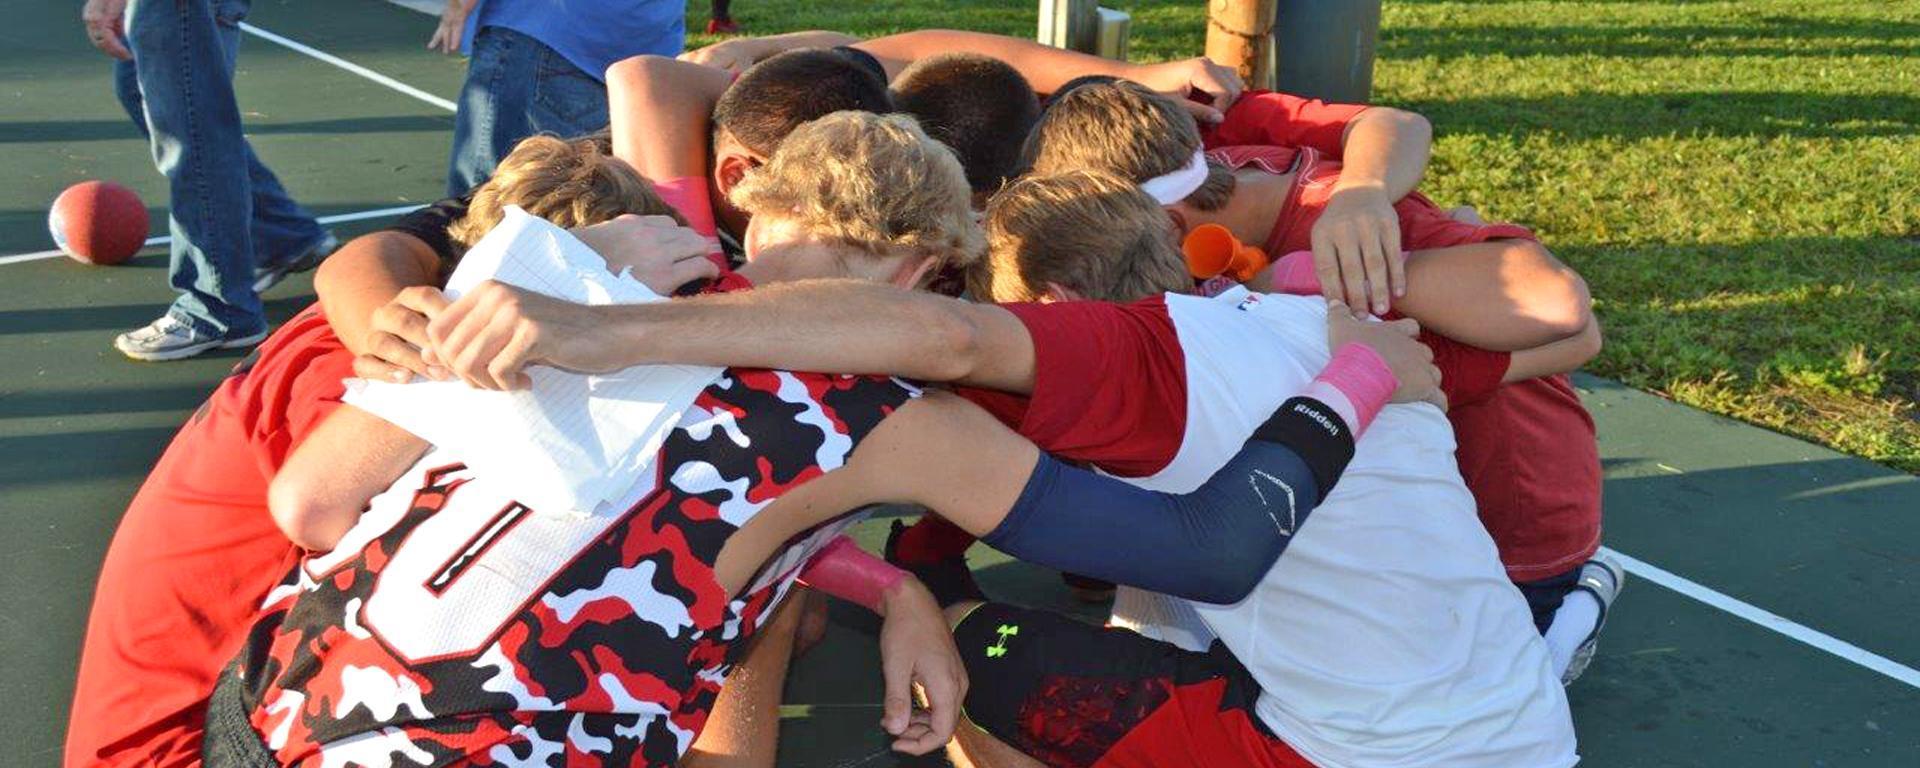 Teens huddle during a dodgeball tournament.